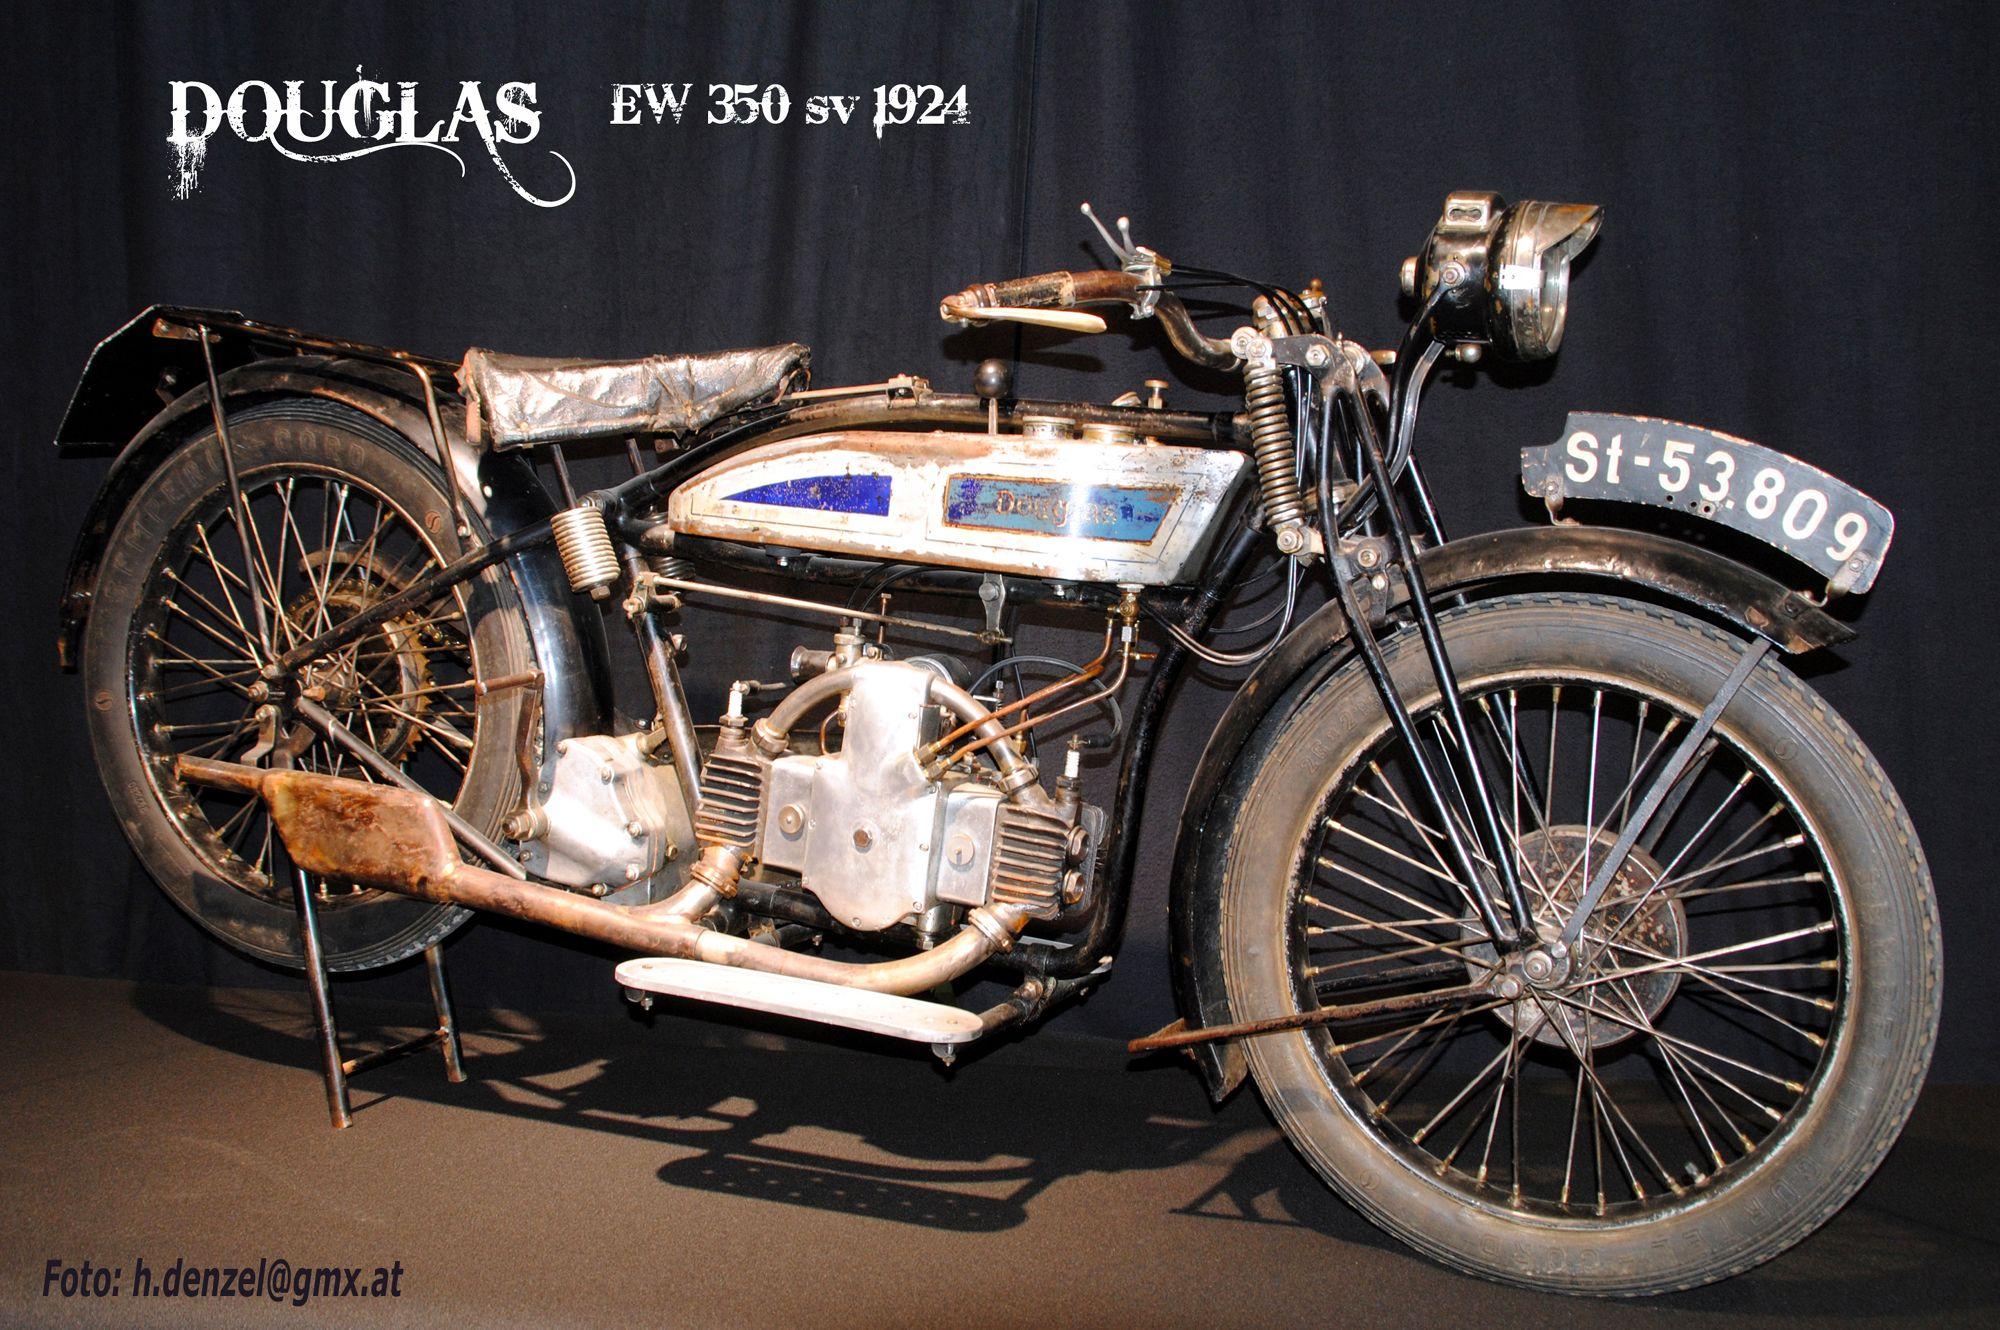 Douglas Ew 350 1924 Old Motorcycles Vintage Motorcycle Motorcyle